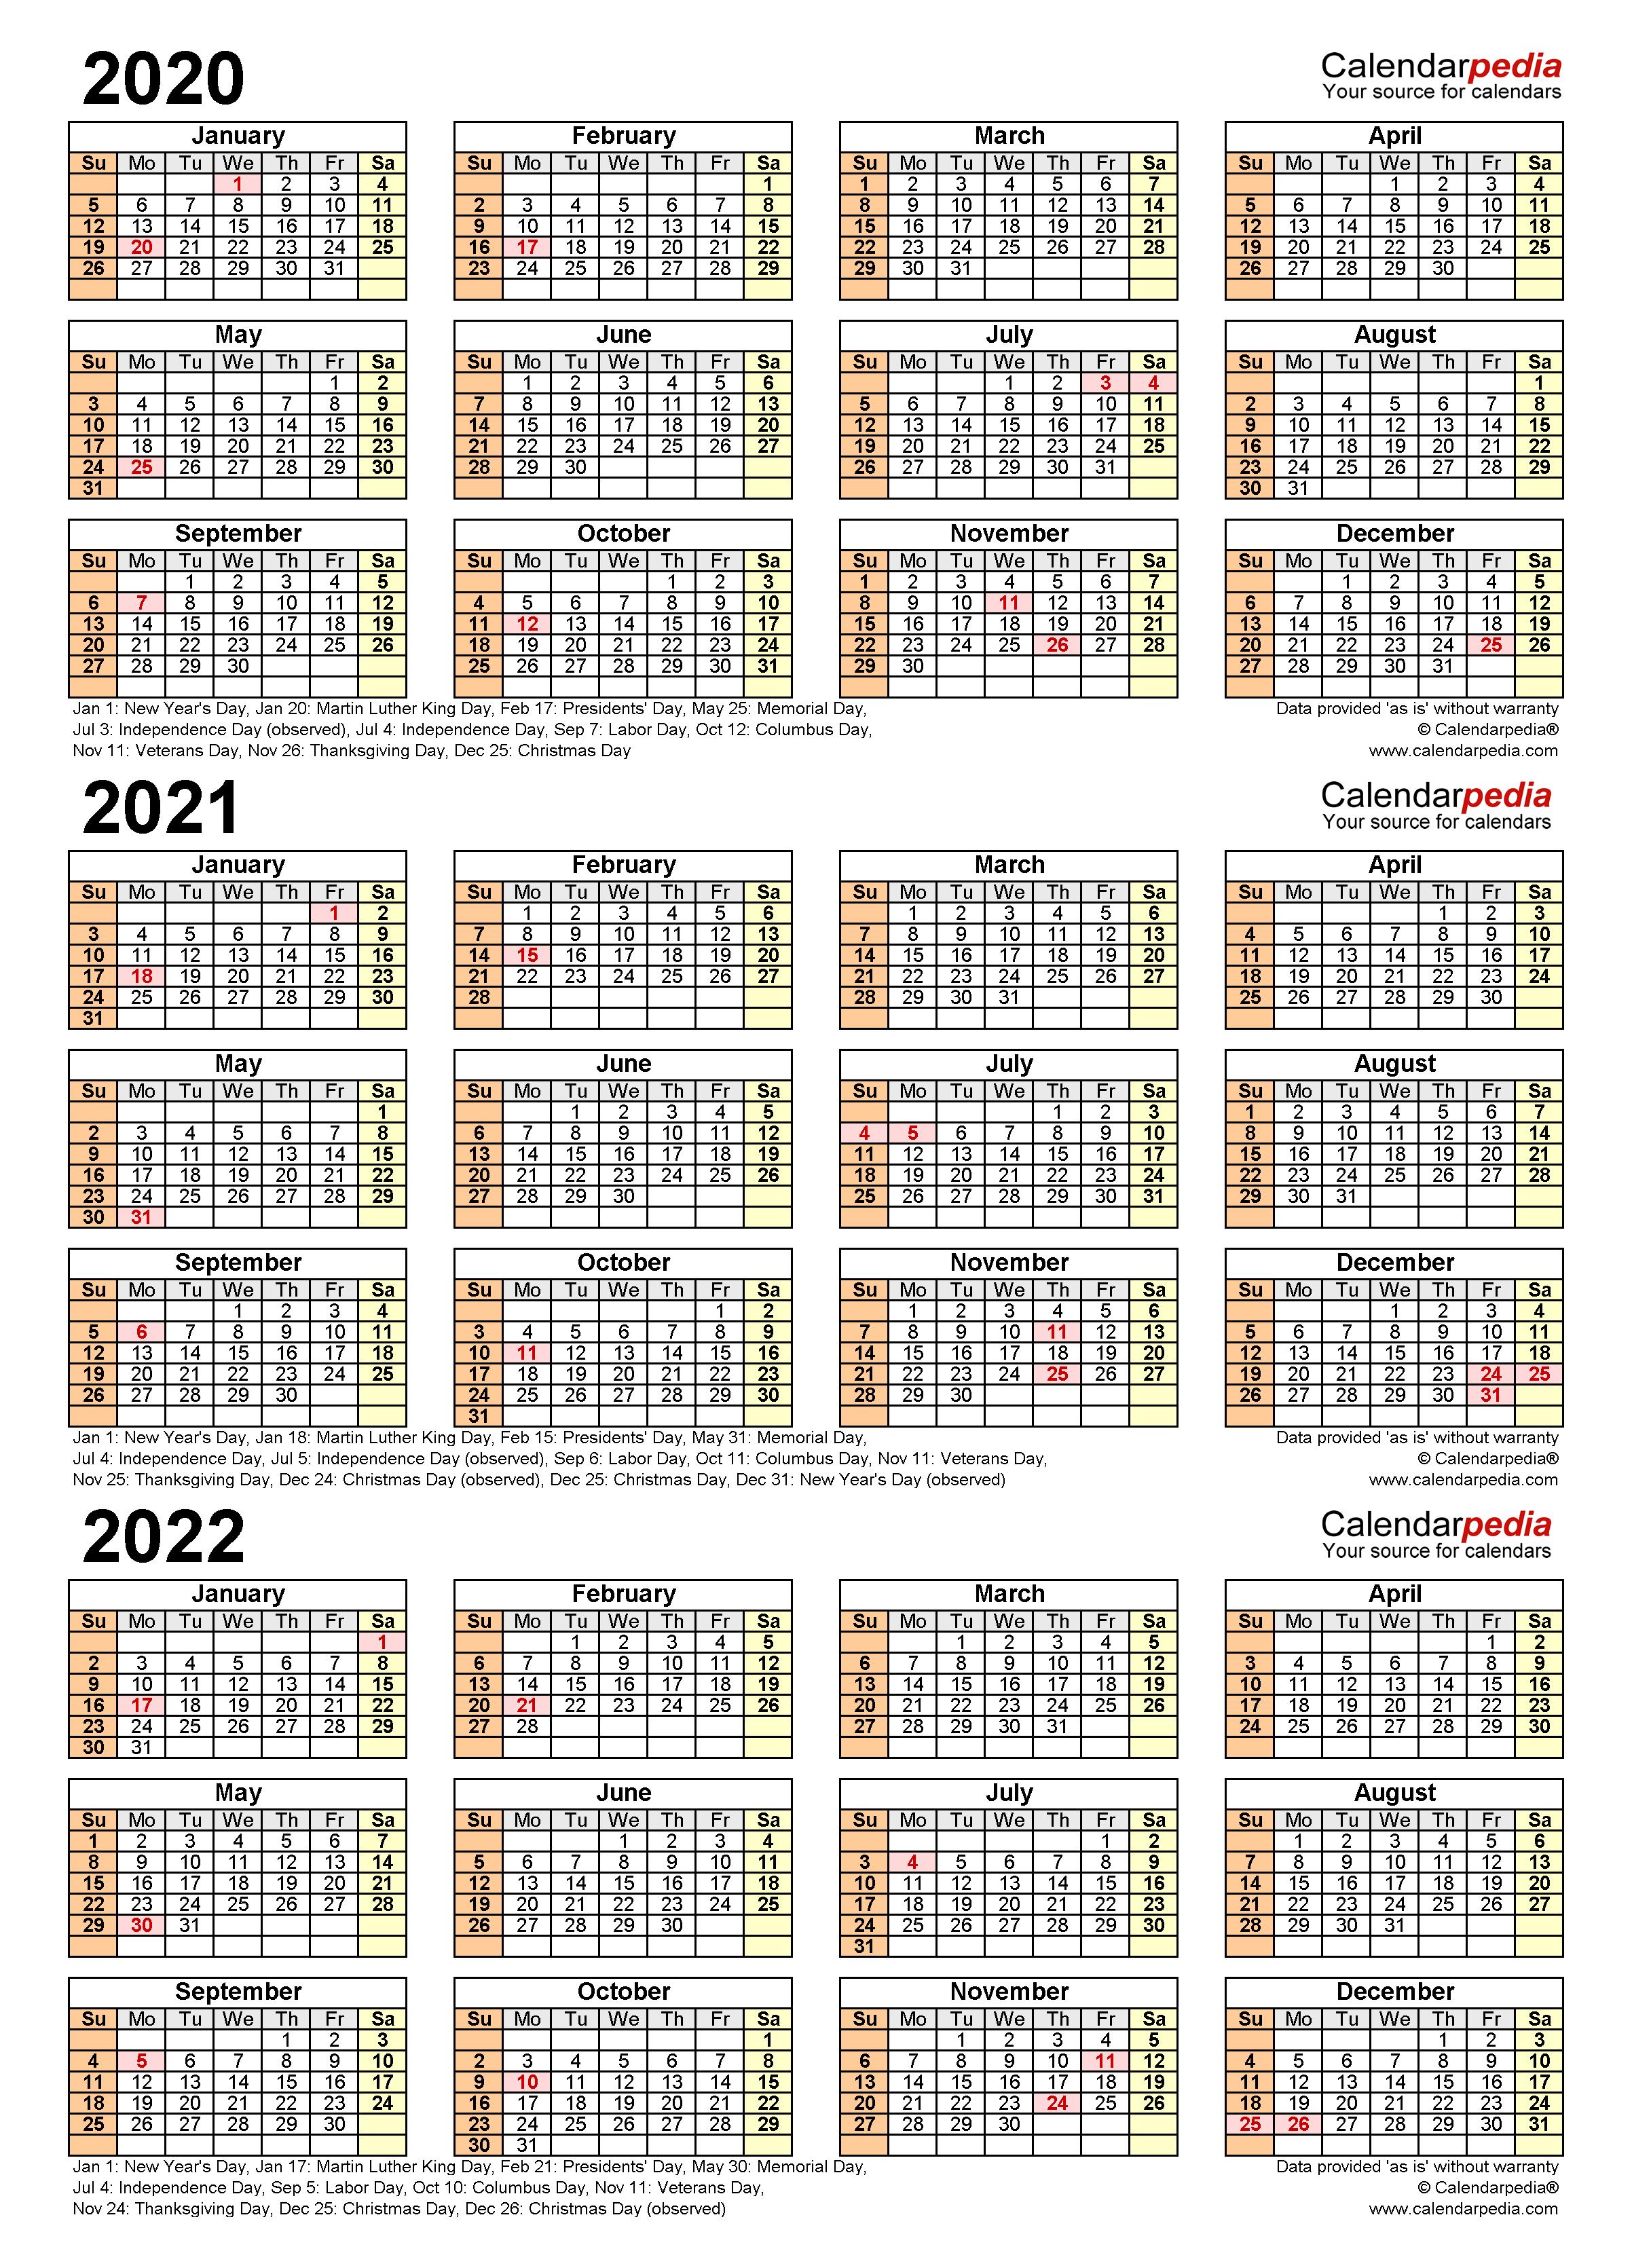 2020-2022 Three Year Calendar - Free Printable Pdf Templates regarding Three Year Printable Calendar 2020 To 2023